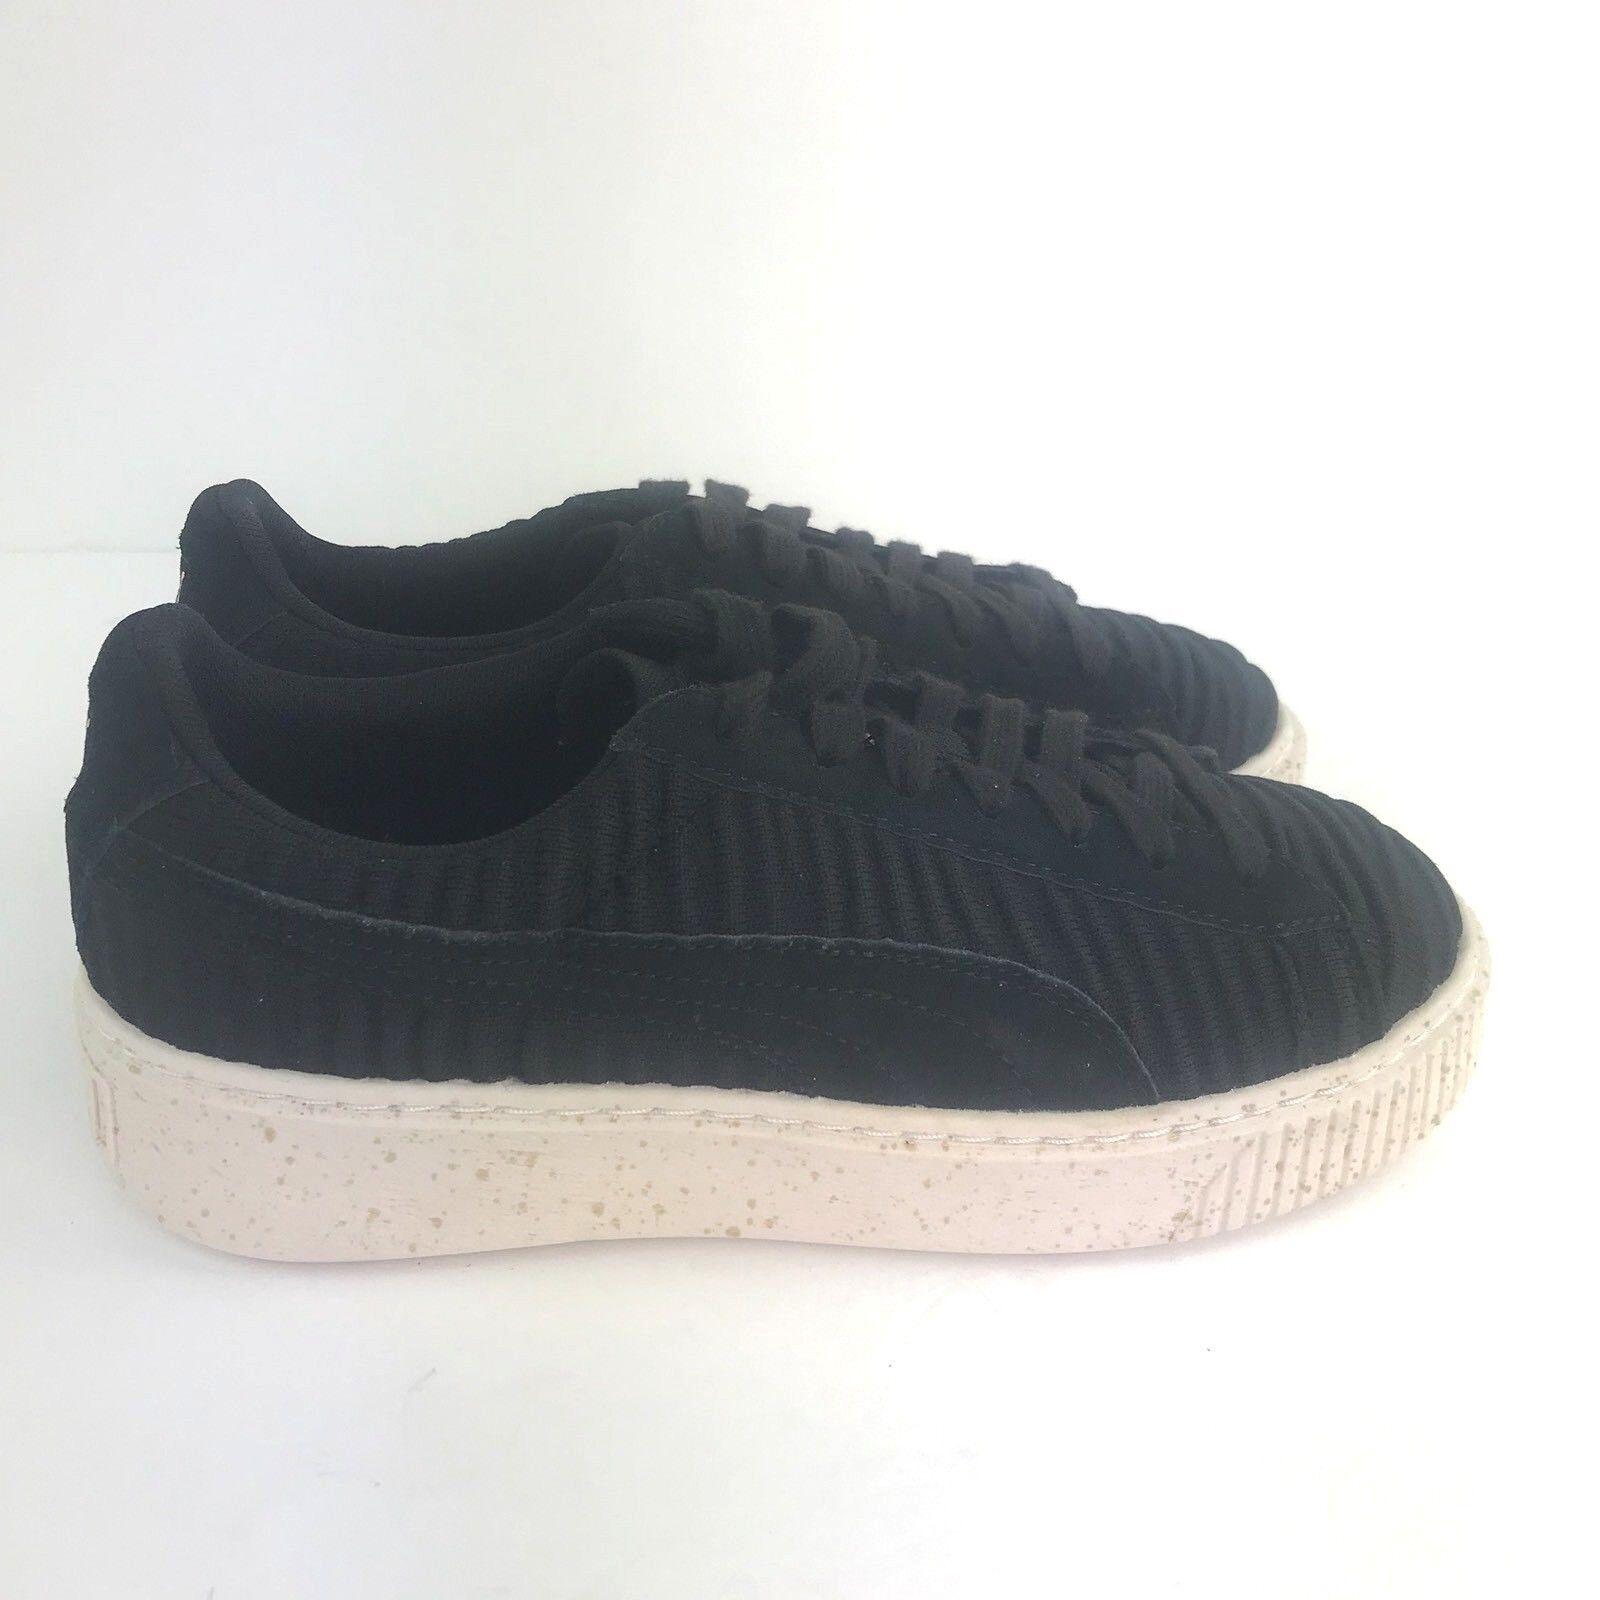 PUMA Evoknit Black Platform Gold Fleck Lace Up Sneakers Shoes Women's Sz 8 New